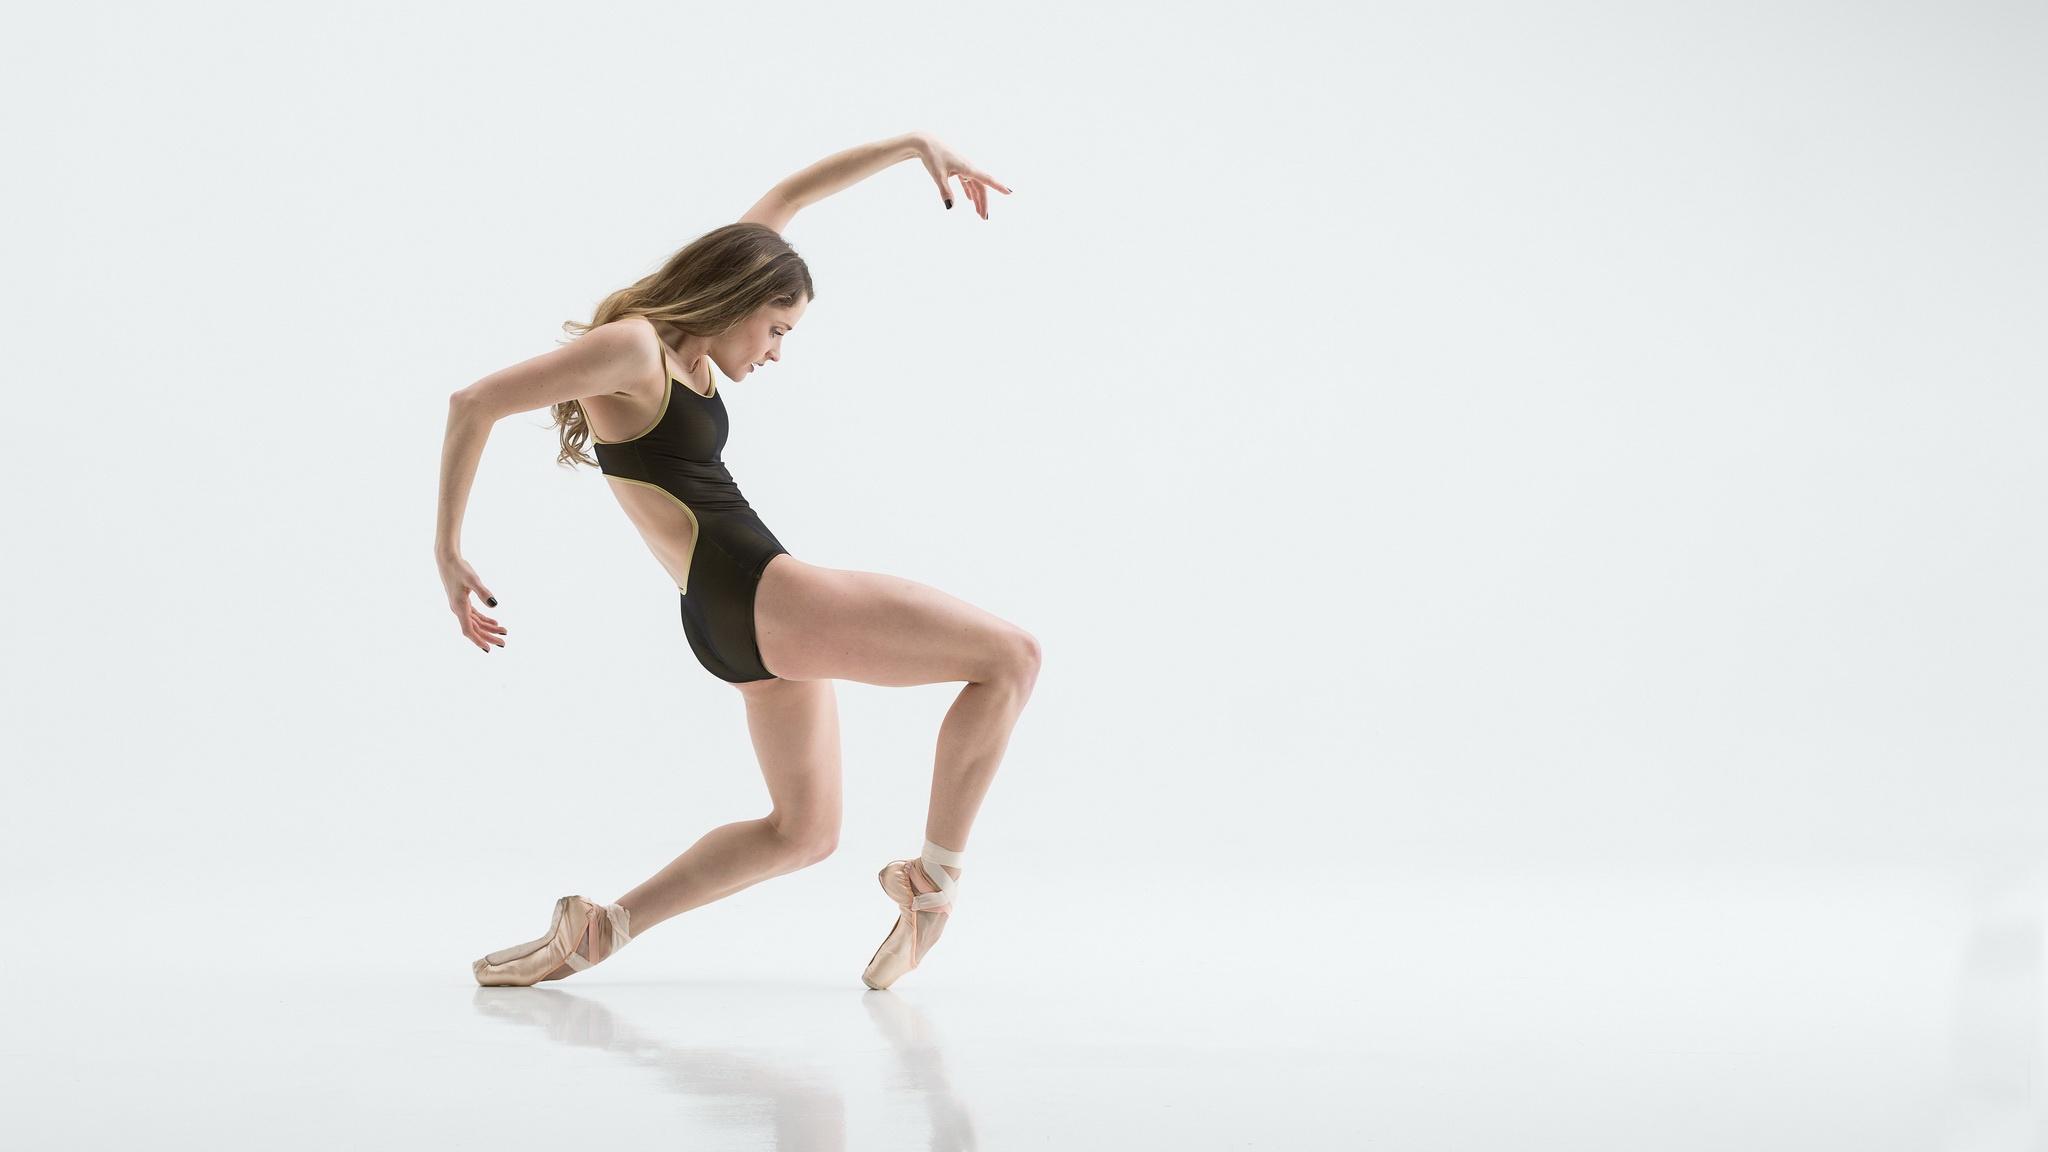 Wallpaper Women Dancer Flexible Simple Background Ballet Slippers 2048x1152 Wallpapermaniac 1562971 Hd Wallpapers Wallhere